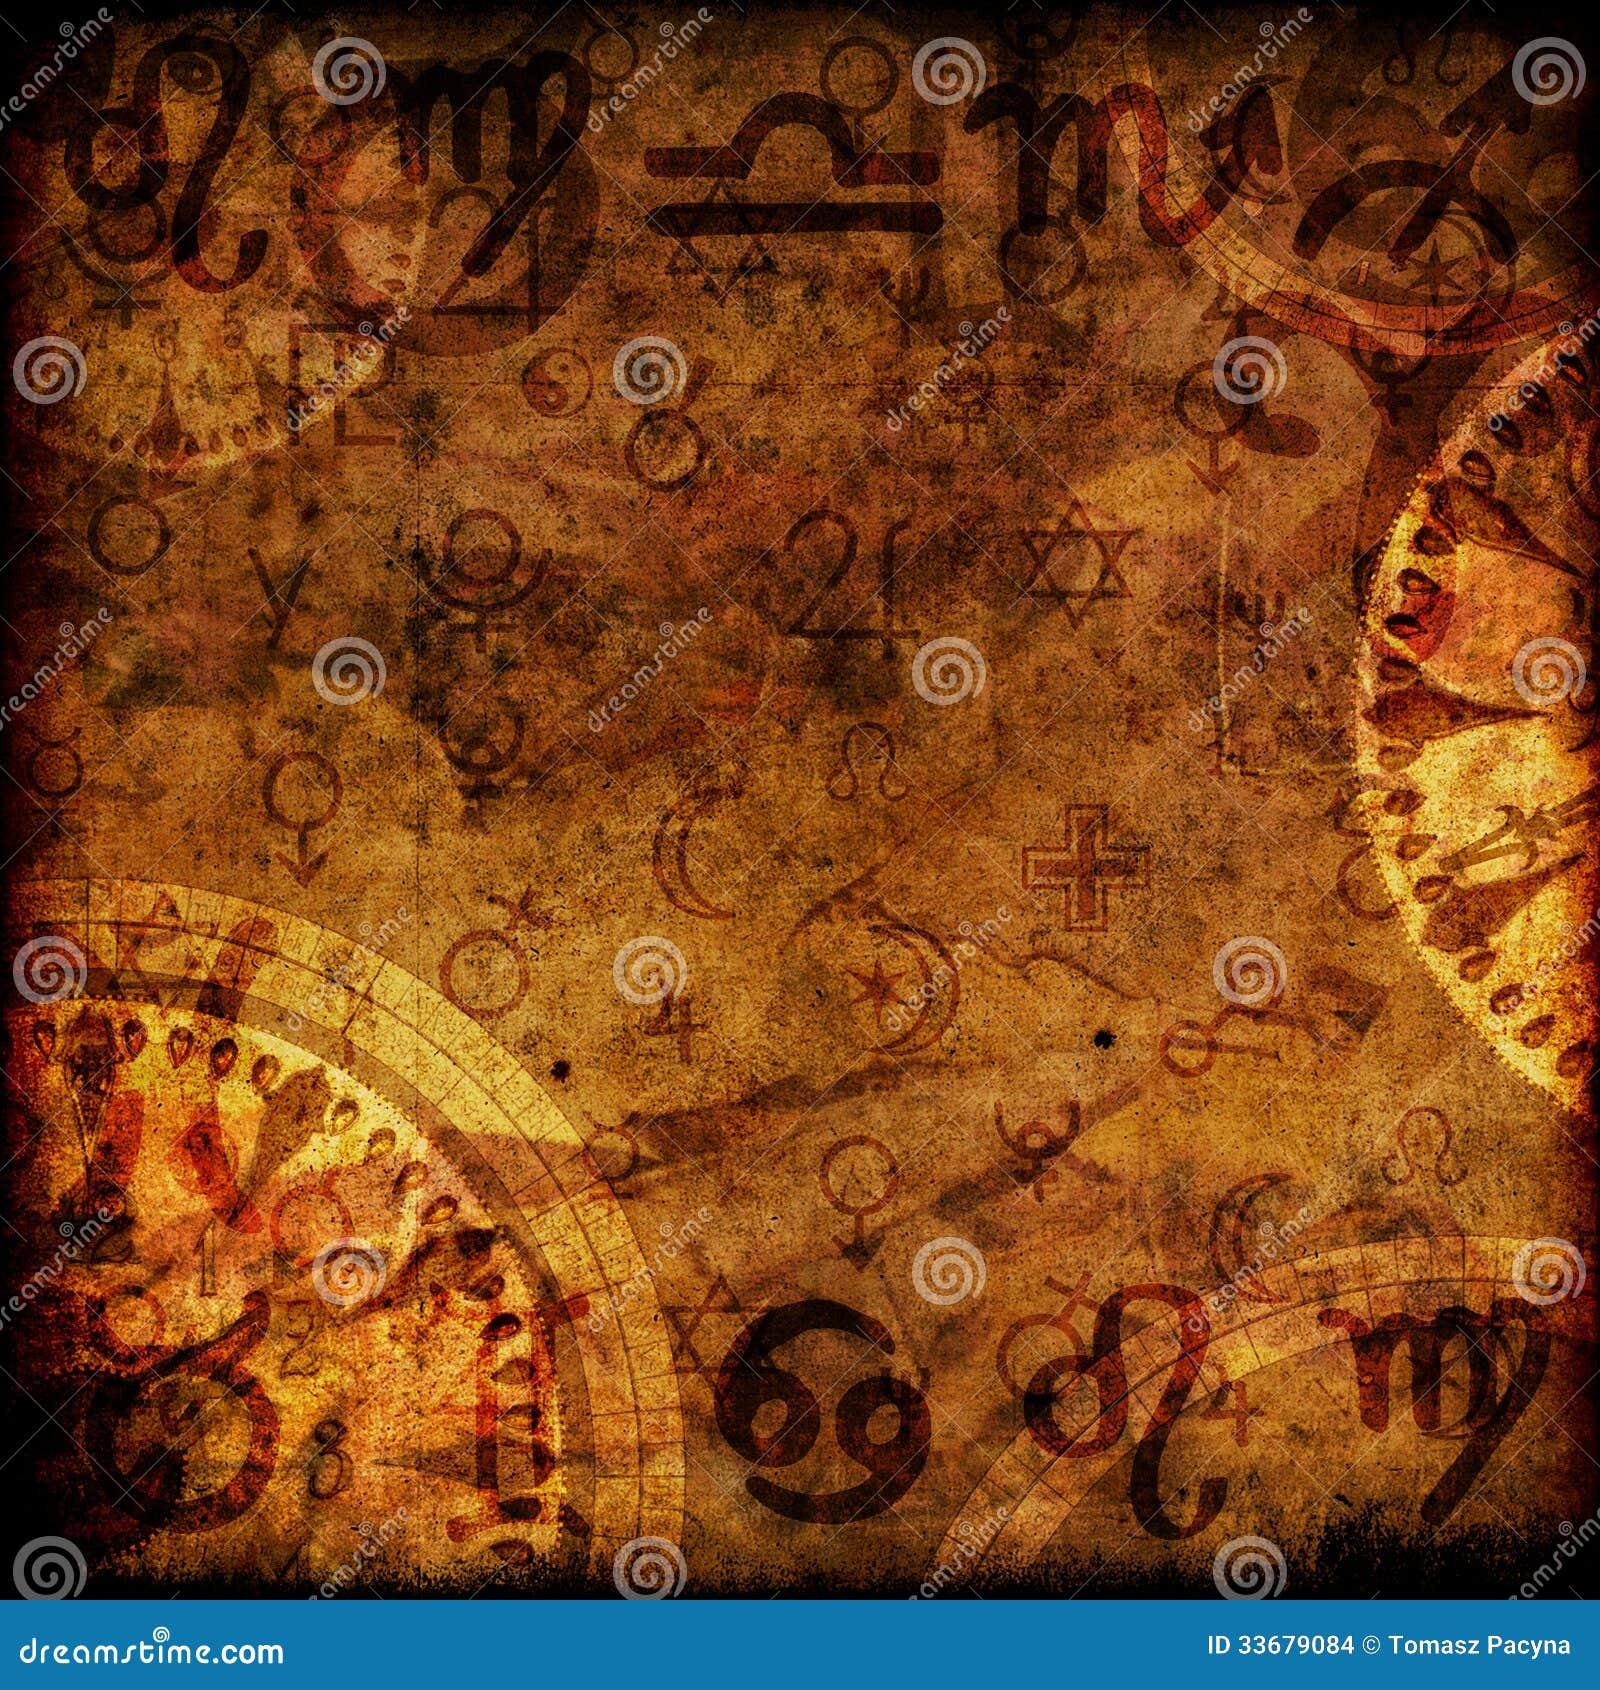 Magic zodiac background